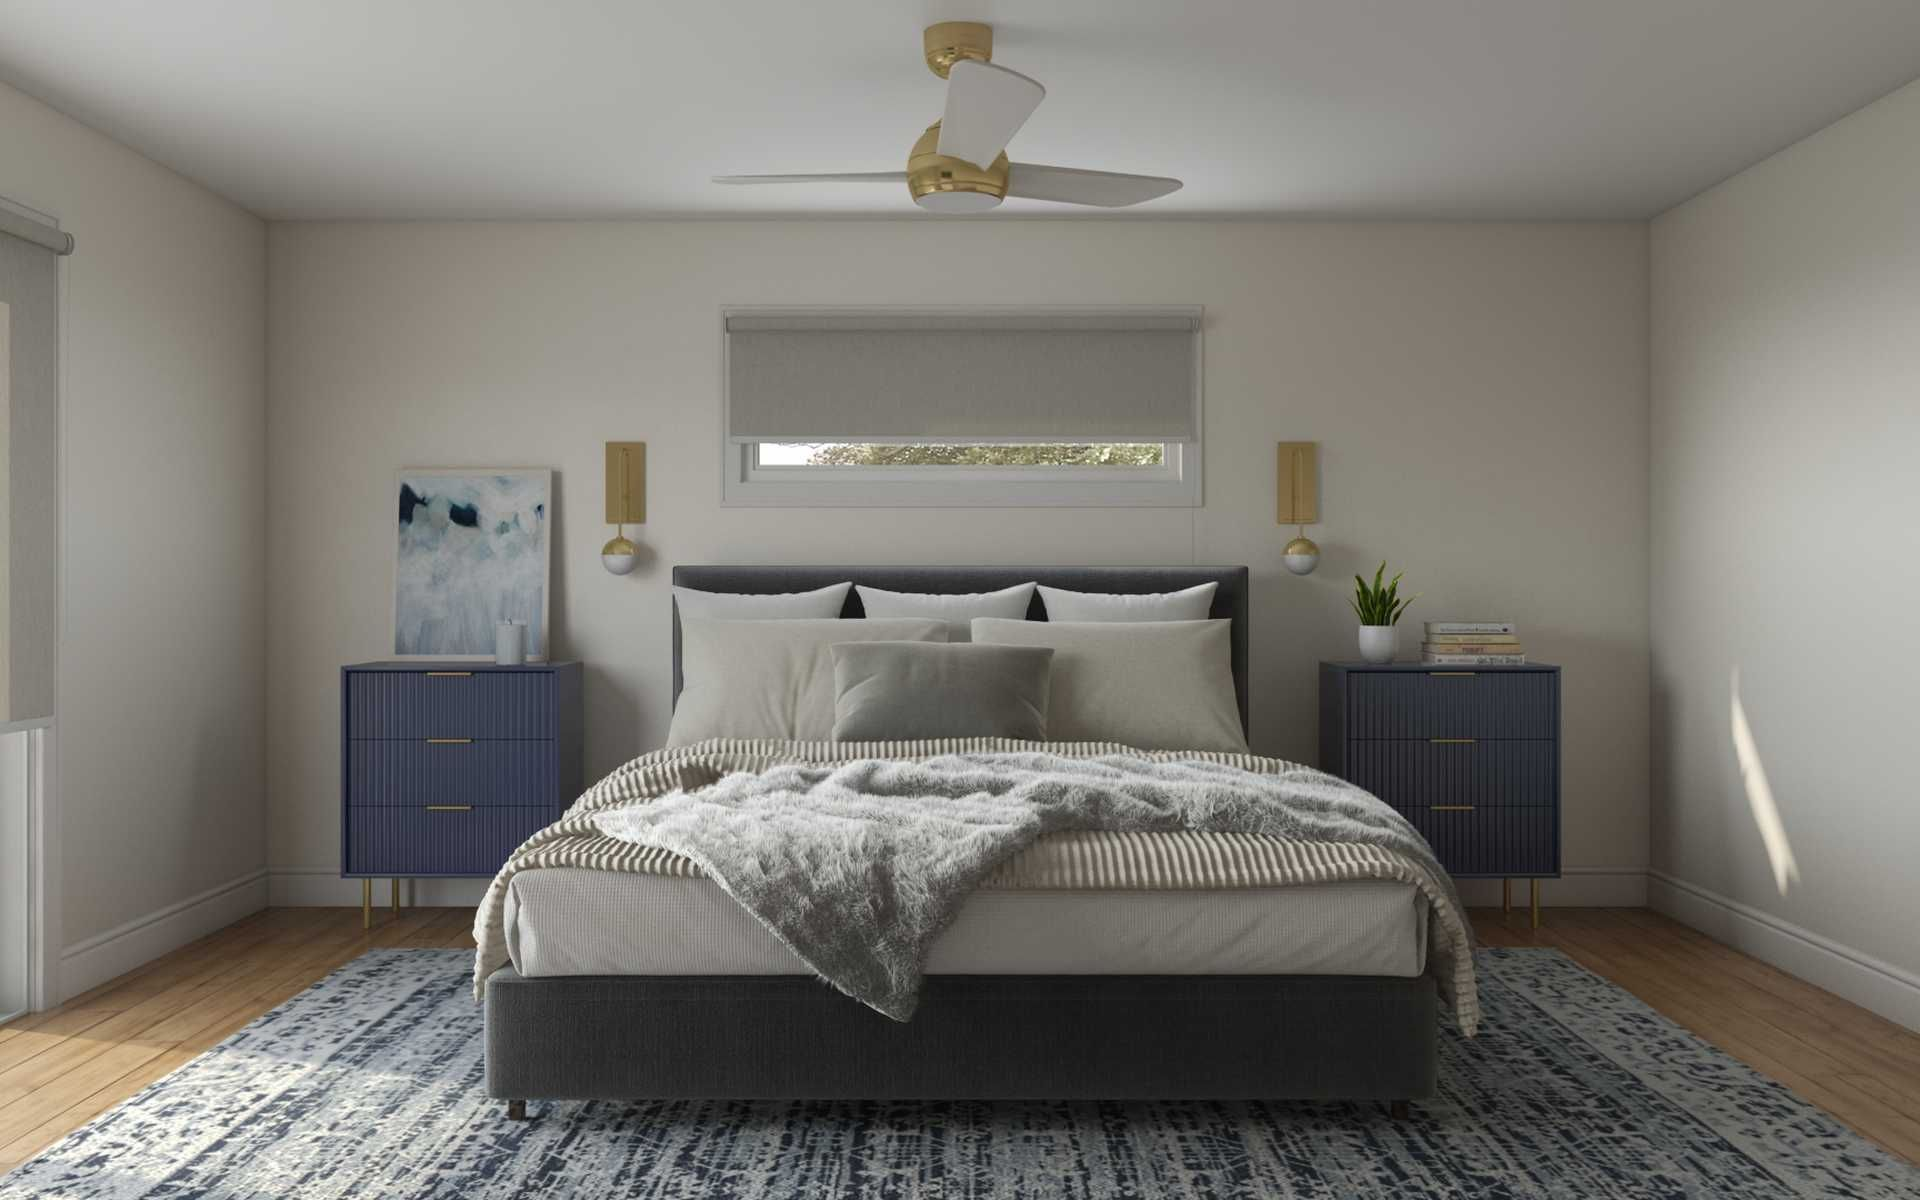 Modern Glam Midcentury Modern Scandinavian Bedroom Design By Havenly Interior Designer Shalene In 2021 Scandinavian Design Bedroom Interior Design Bedroom Design